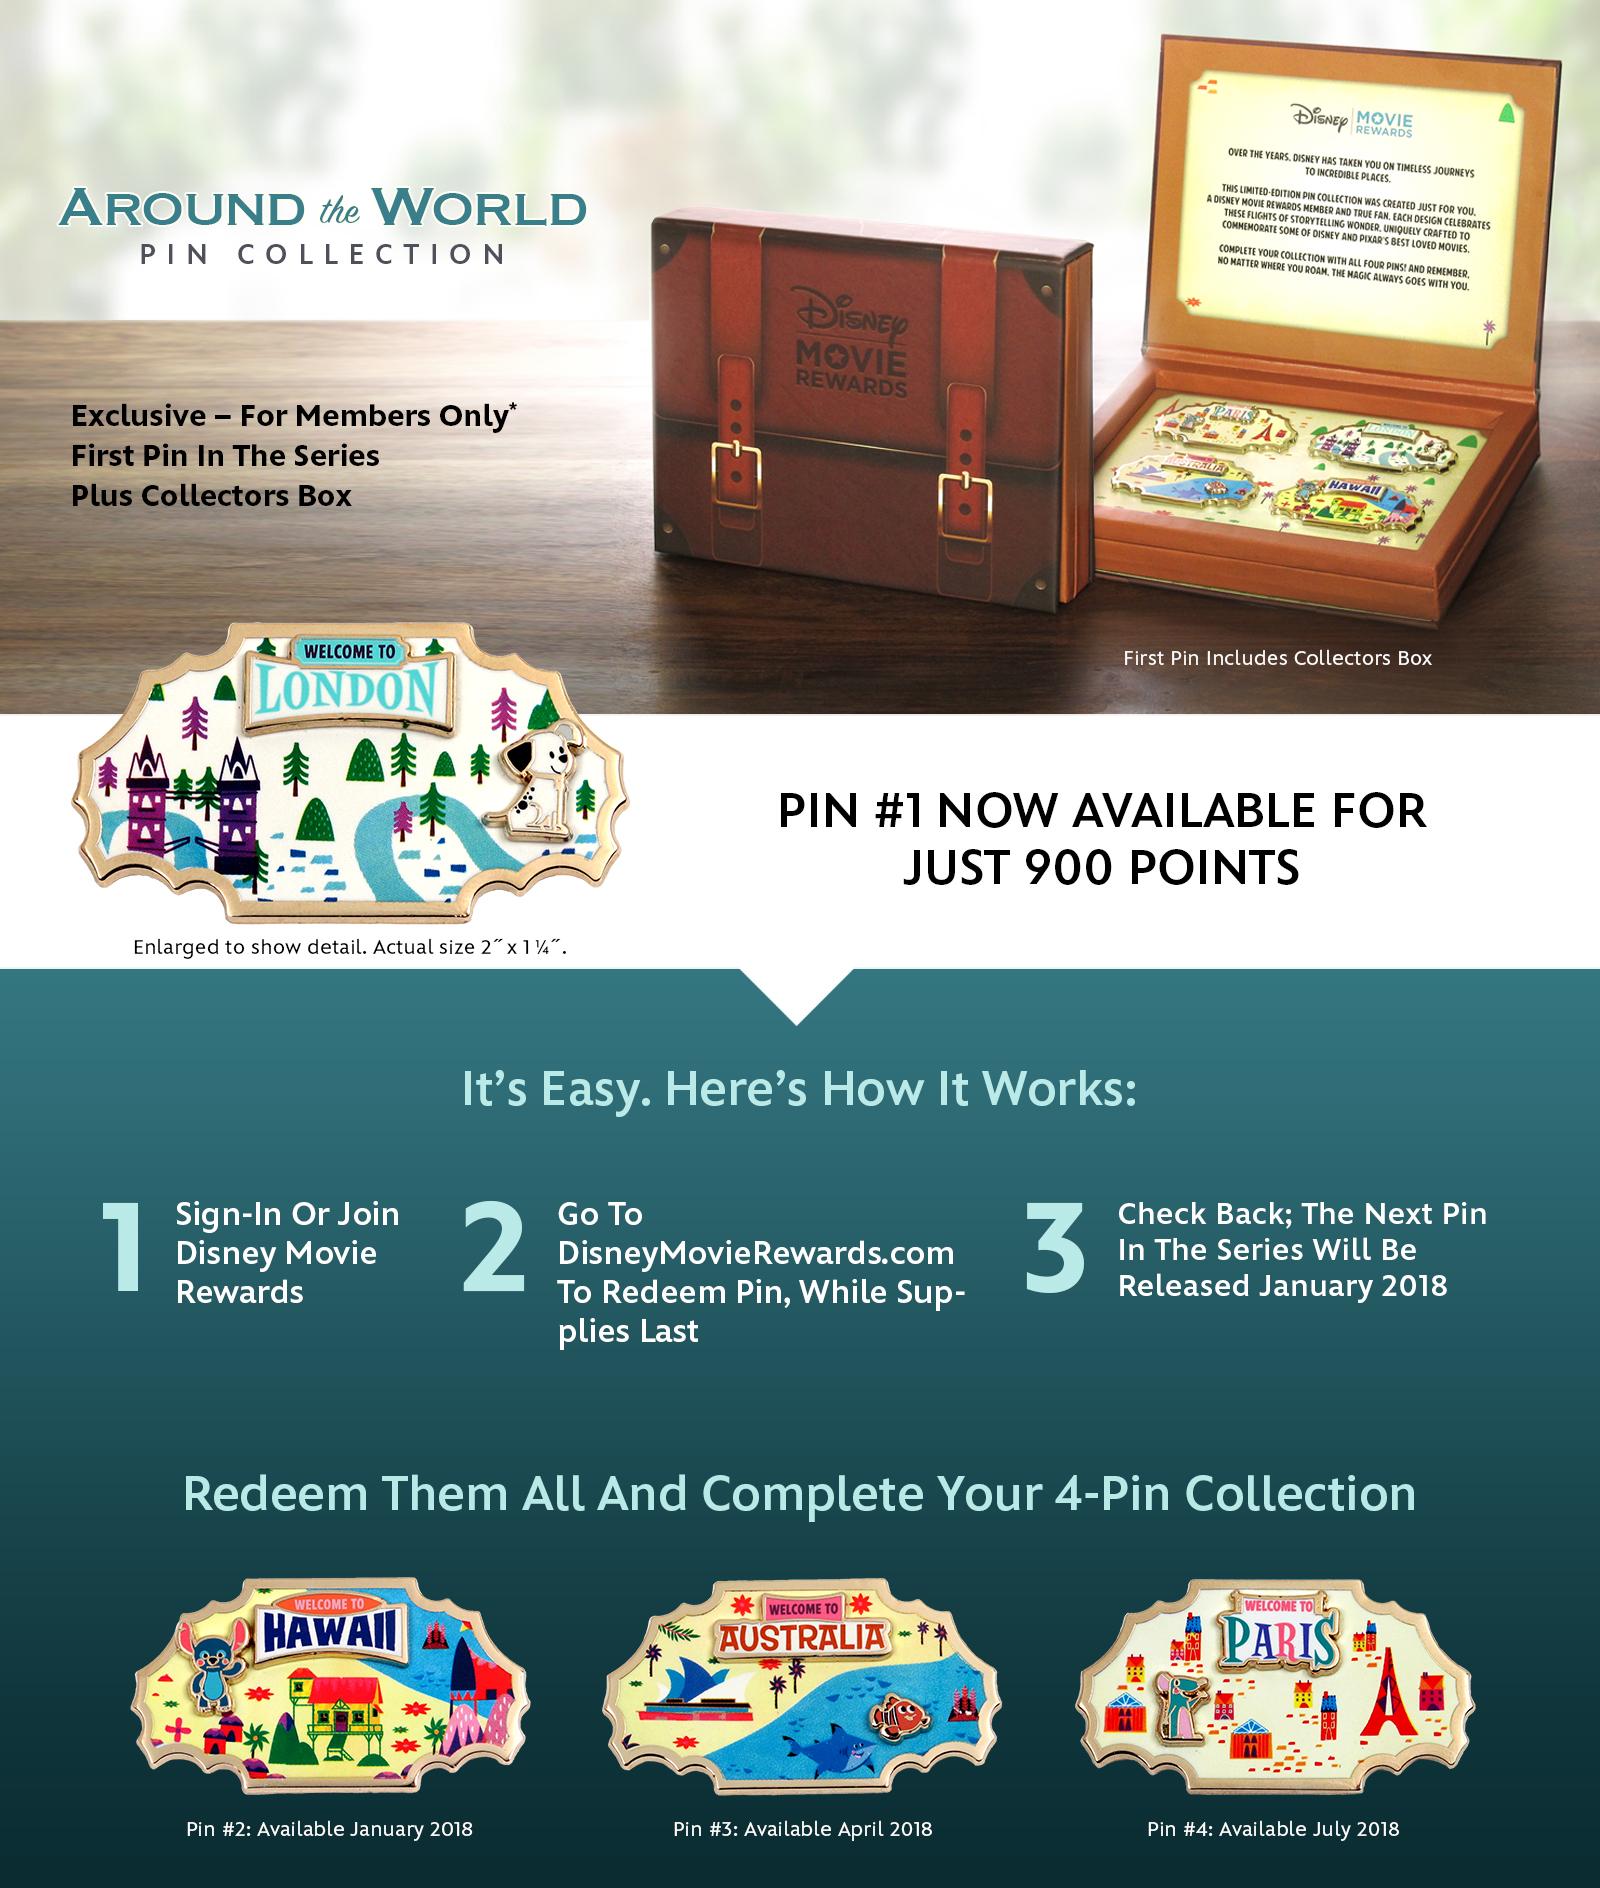 Disney Movie Rewards' Around The World Pin Collection: redeem for 900 points